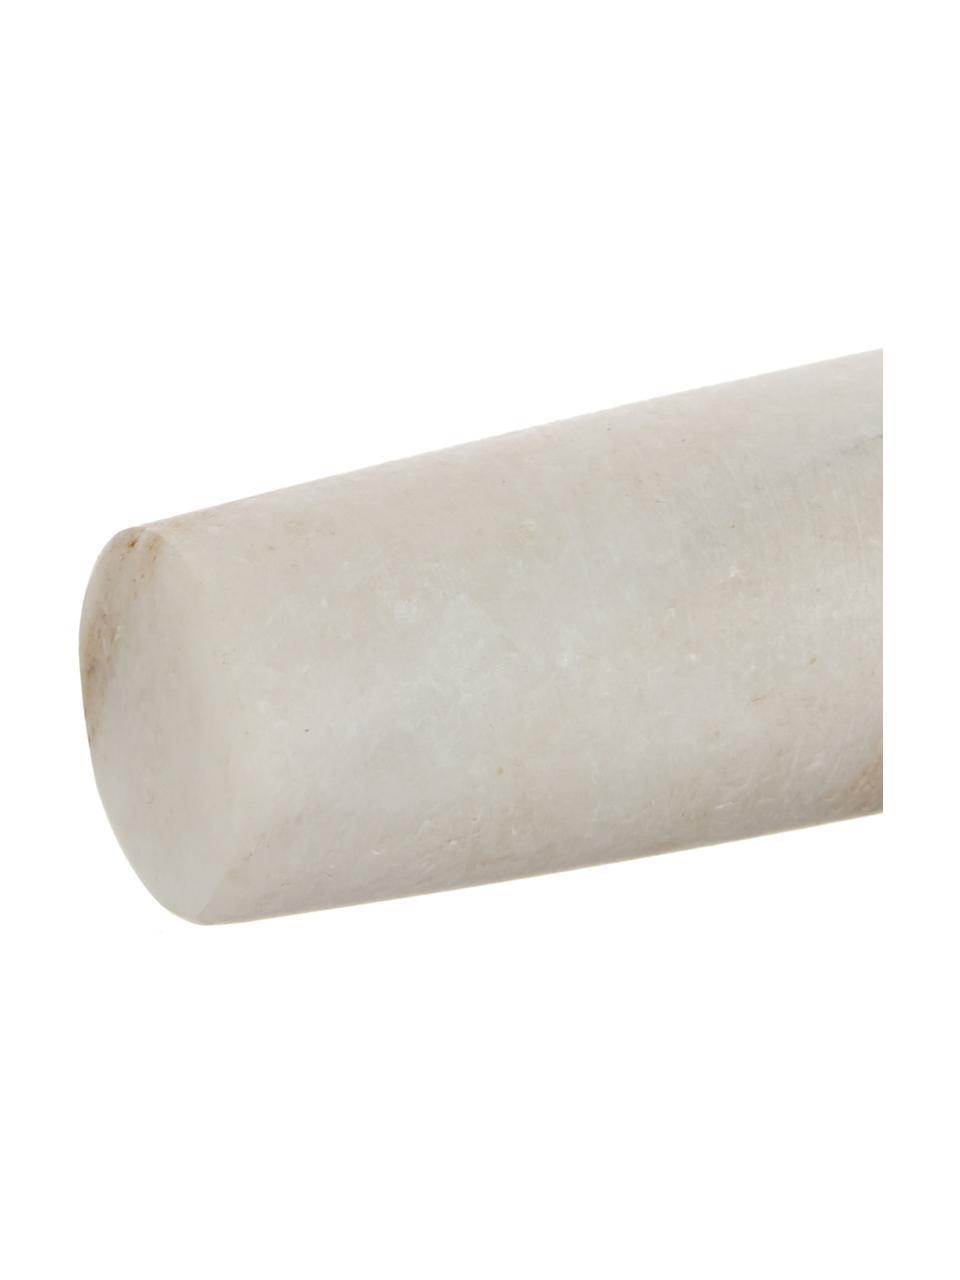 Marmor-Nudelholz Maggie, Marmor, Weiß, Ø 3 x L 29 cm